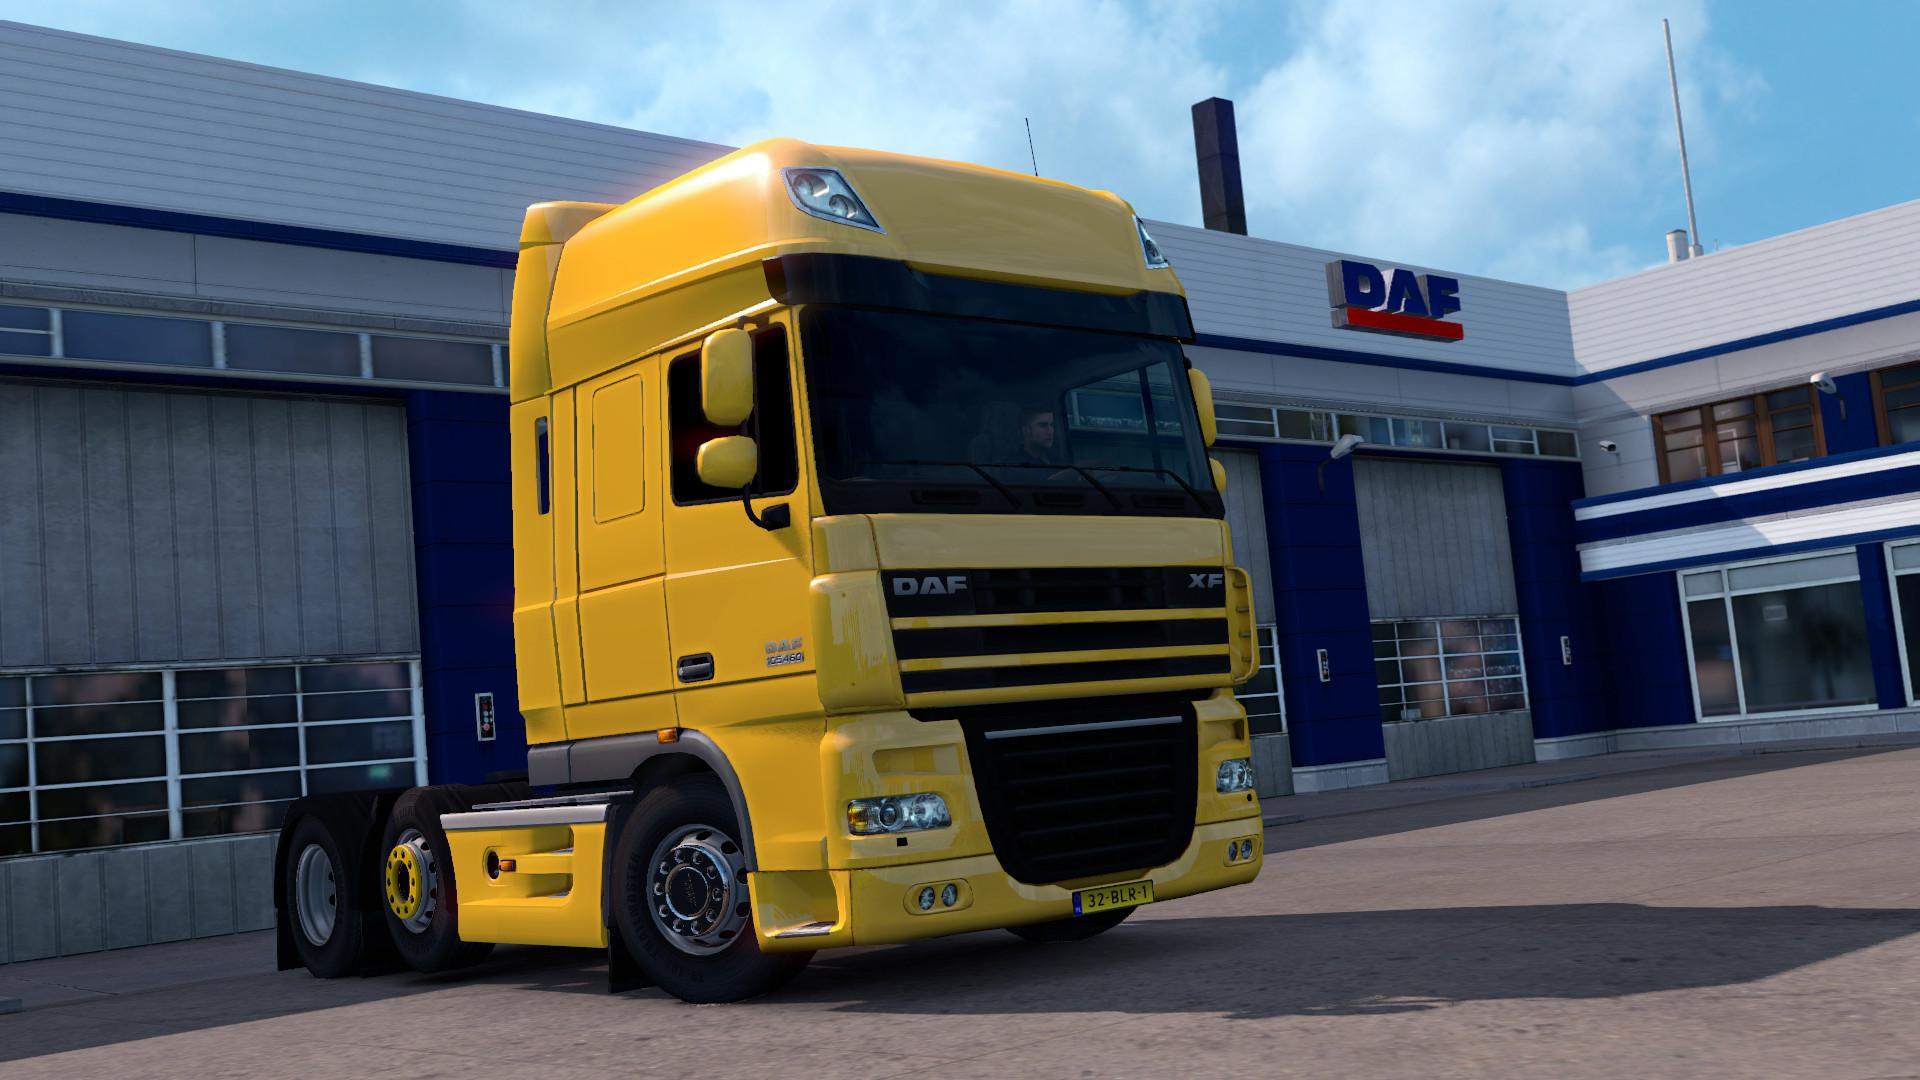 DAF XF BY 50K V36 Truck Euro Truck Simulator 2 Mods